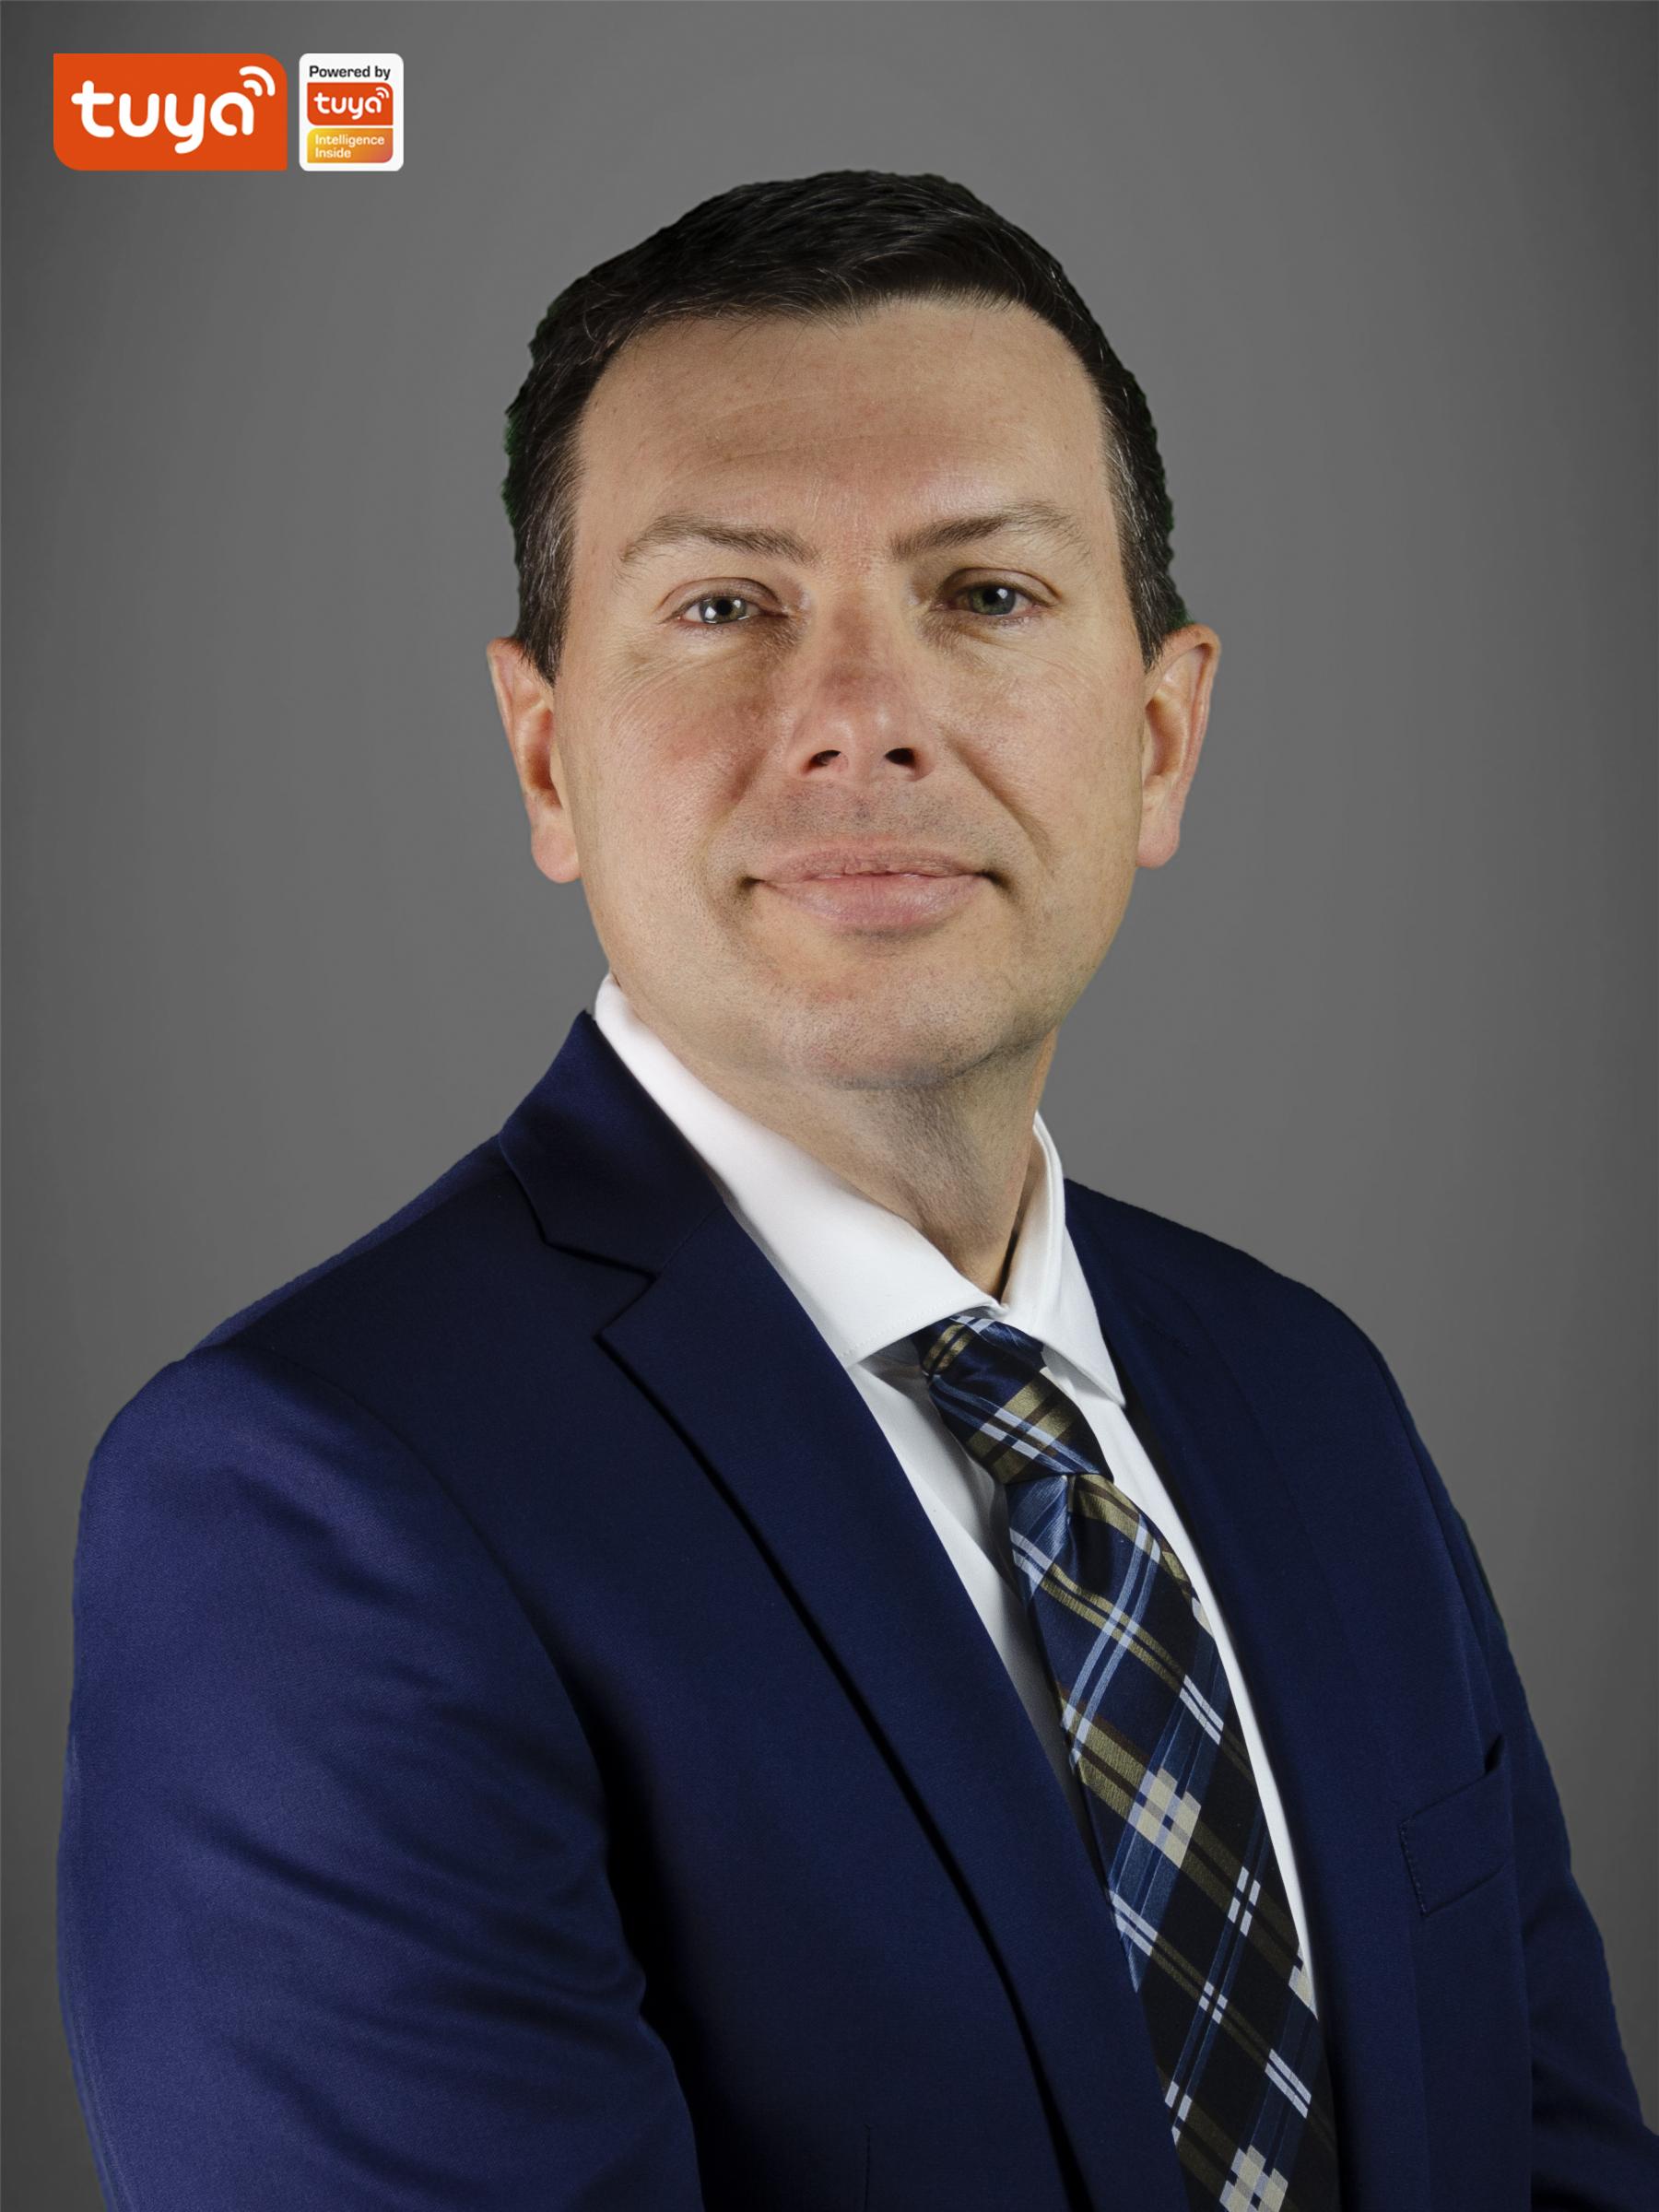 General Manager of Tuya Smart: Fritz Werder